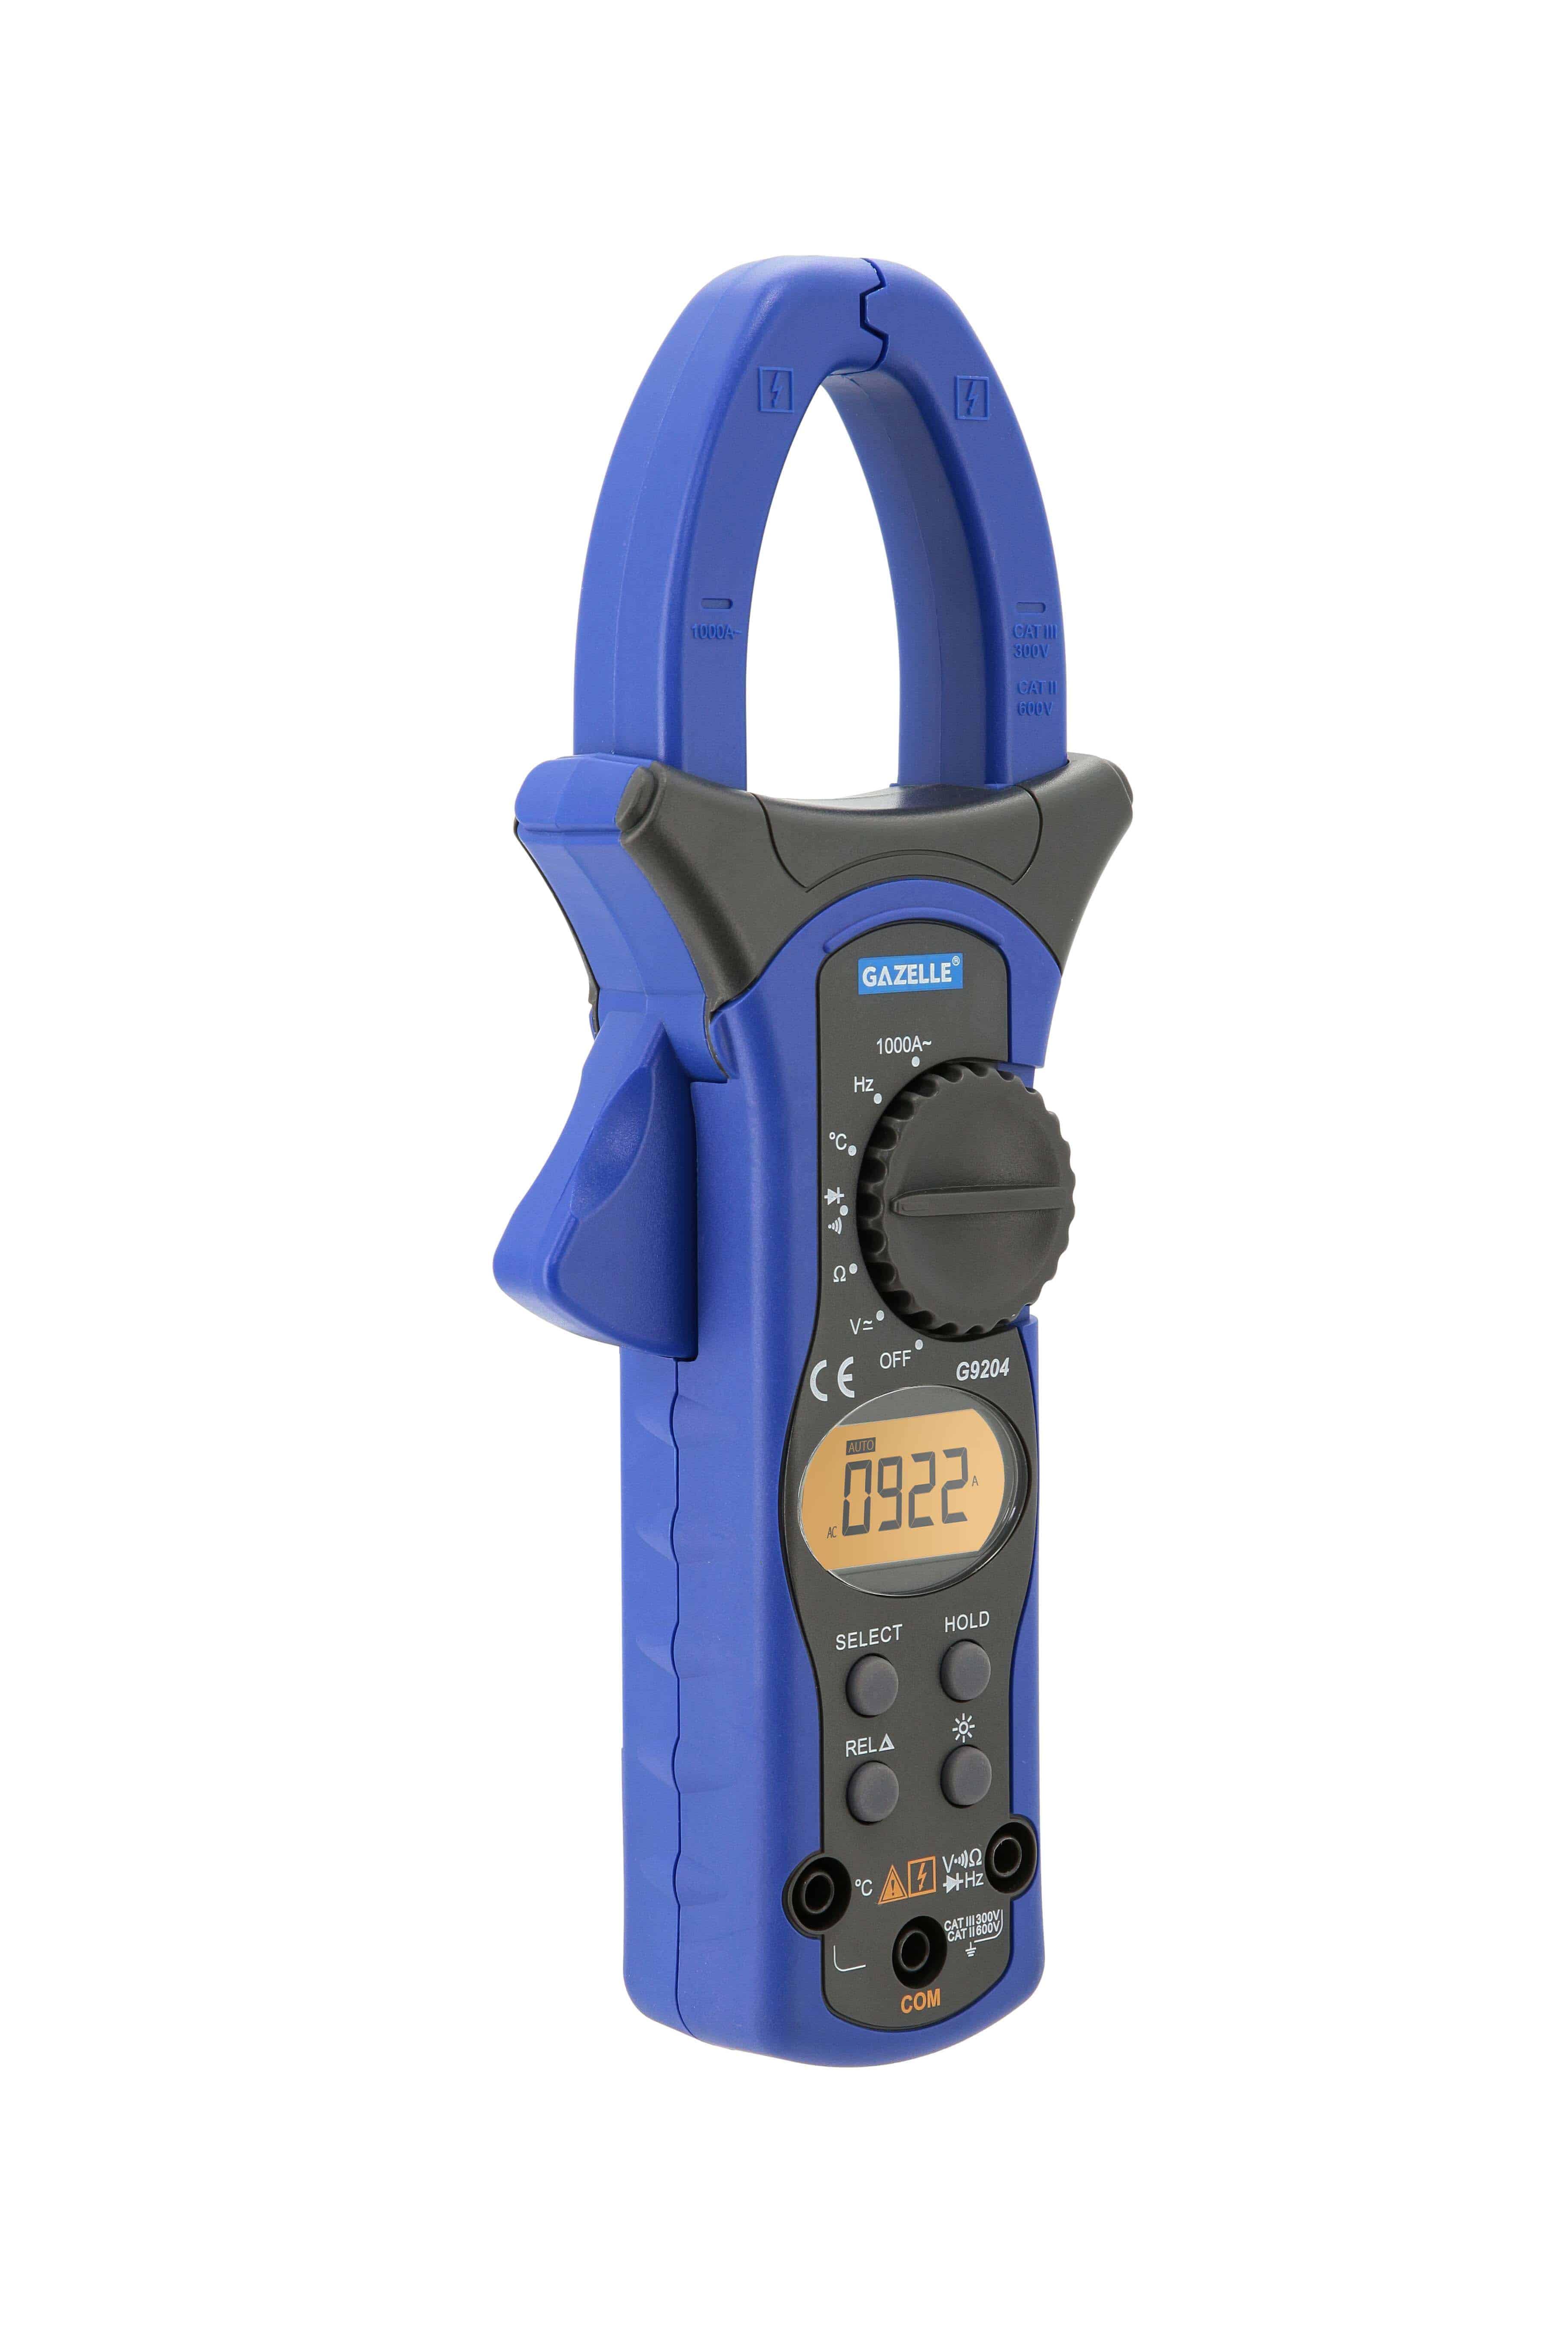 GAZELLE G9204 - 1000A Auto Range Digital Clamp Meter